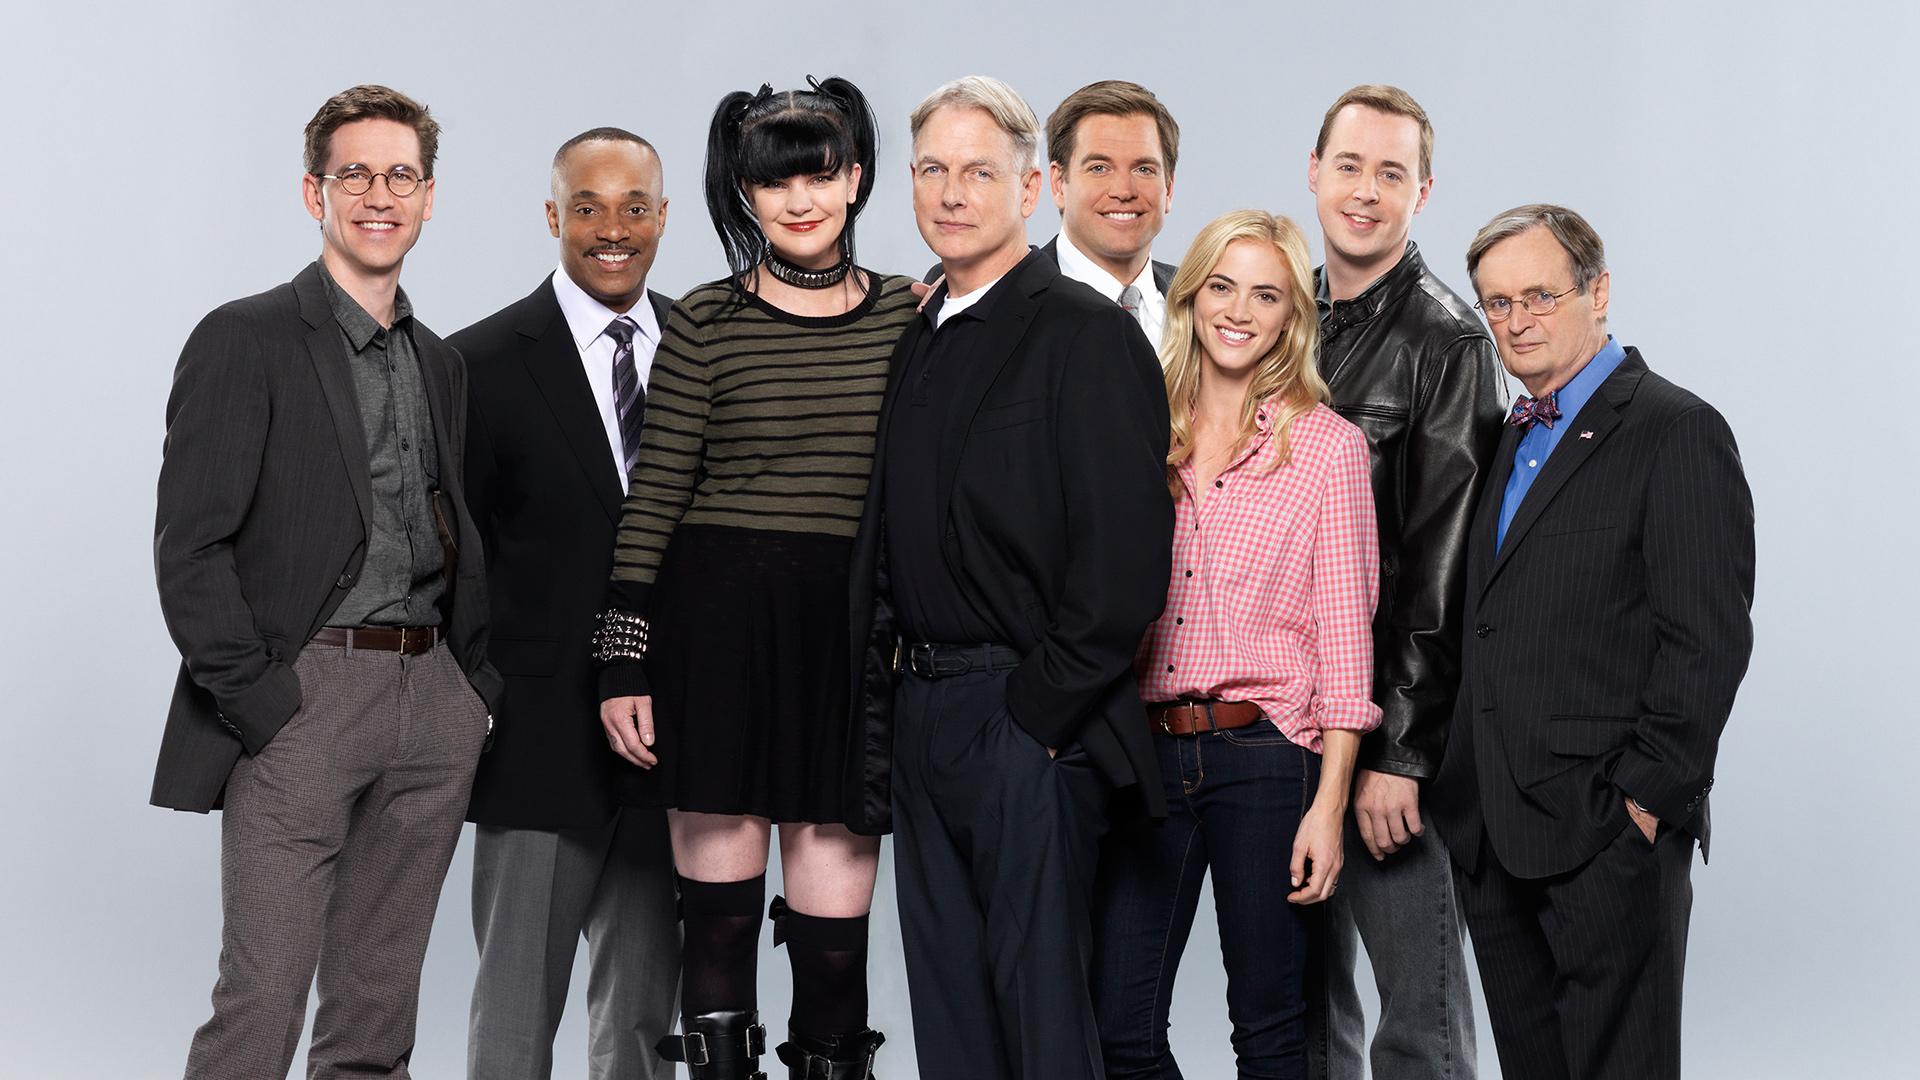 ncis tv series cast - photo #1